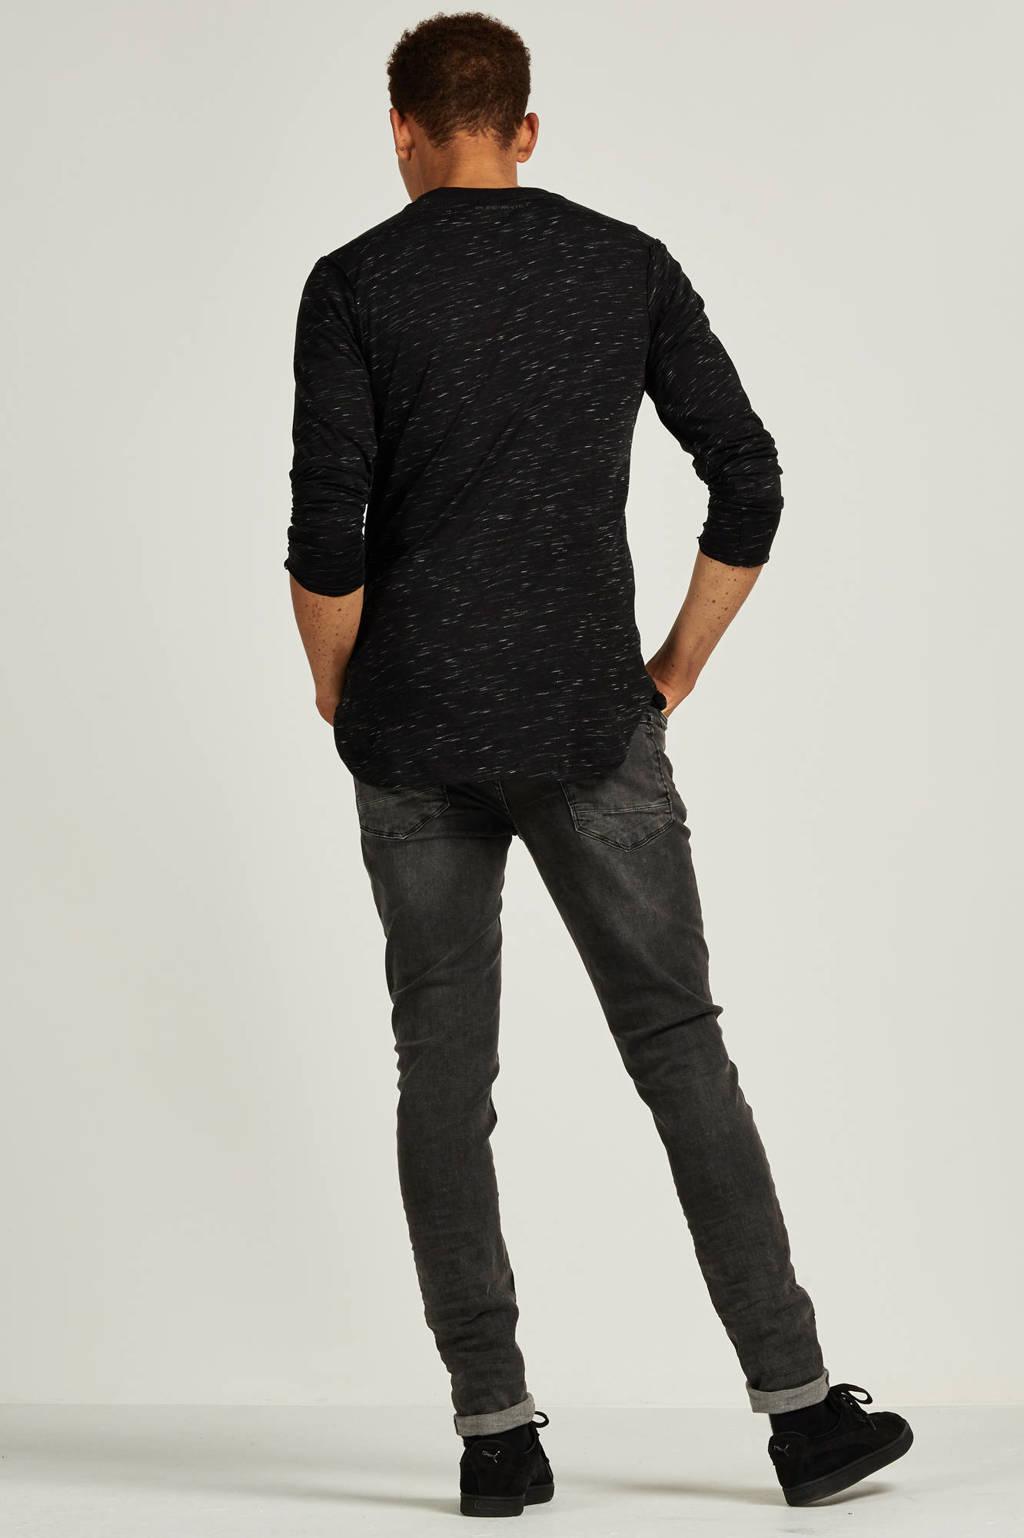 Fit Jone Jeans Purewhite 126 The Slim vmwOnPyN80